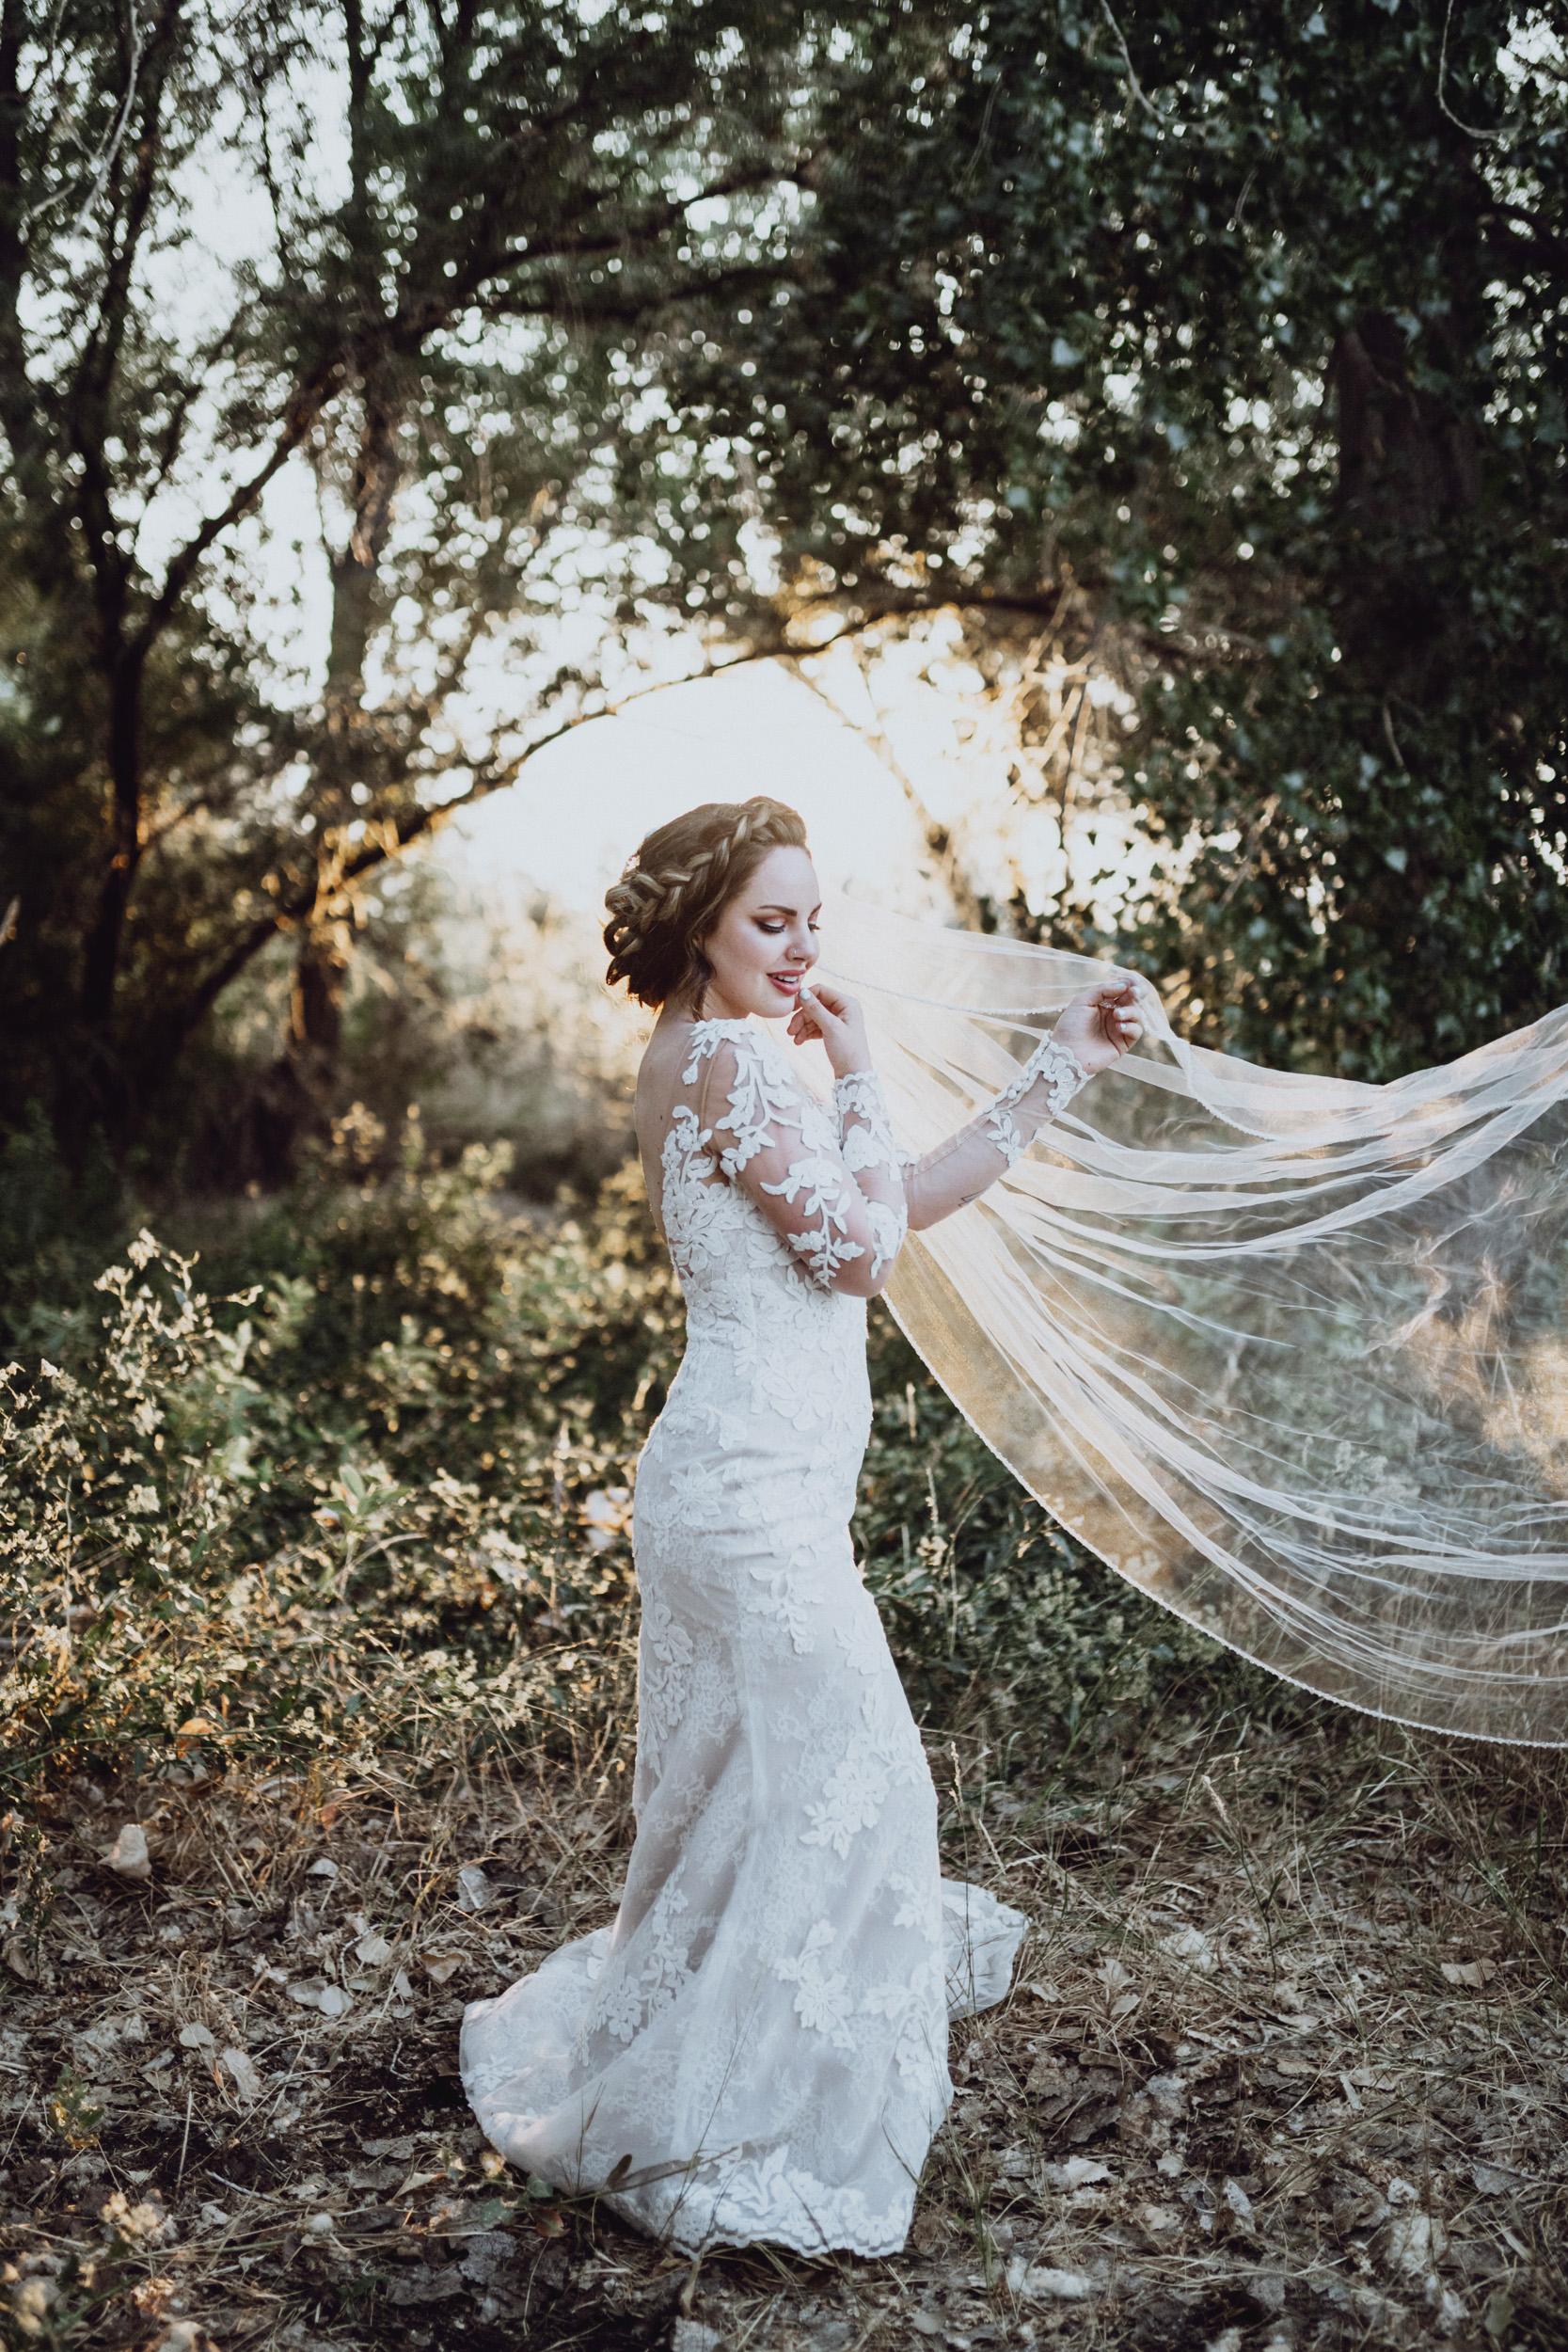 Bride in lace dress standing in grassy field